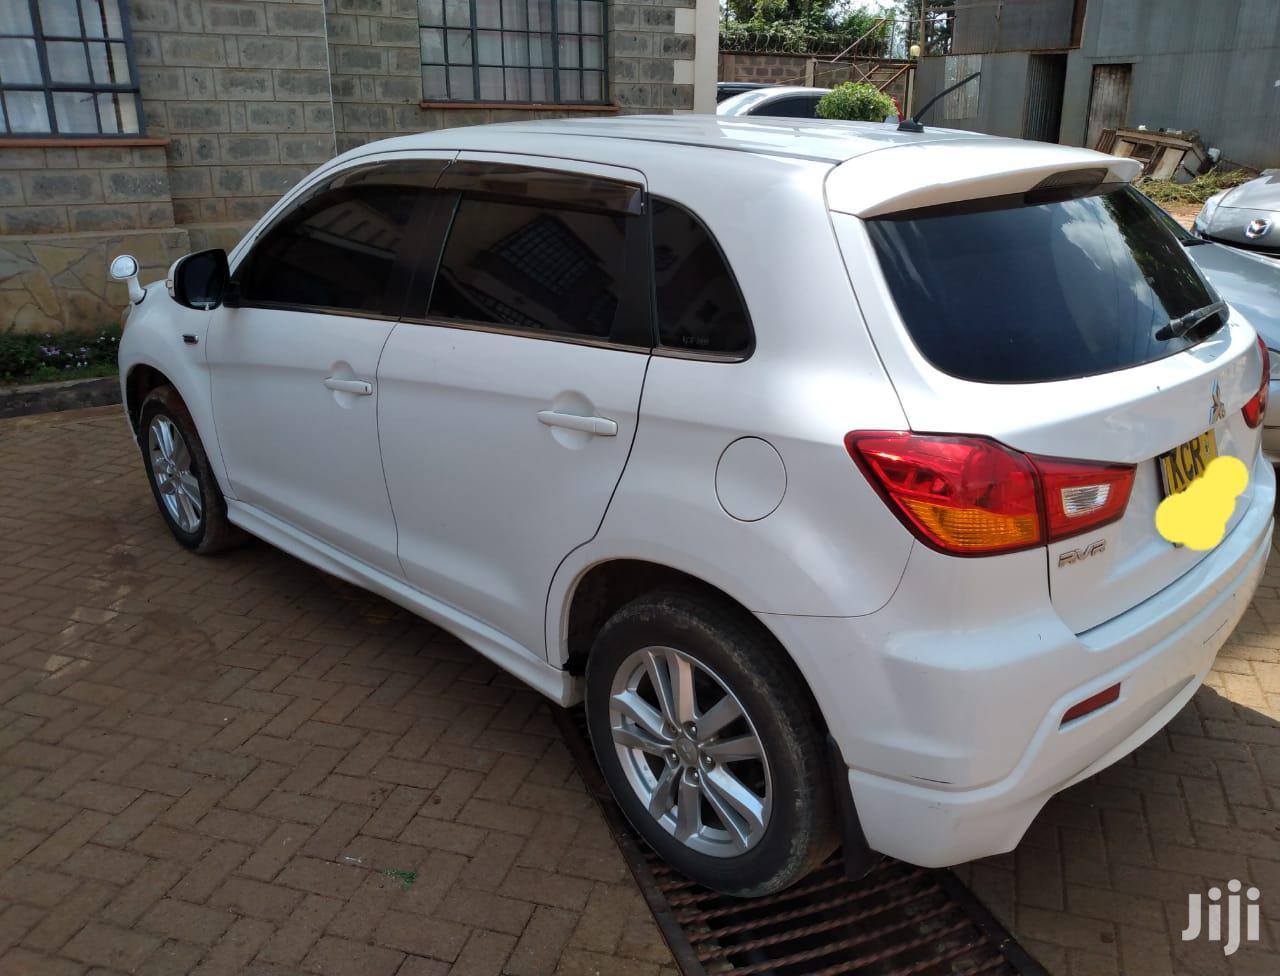 Mitsubishi RVR 2011 2.0 White | Cars for sale in Kilimani, Nairobi, Kenya